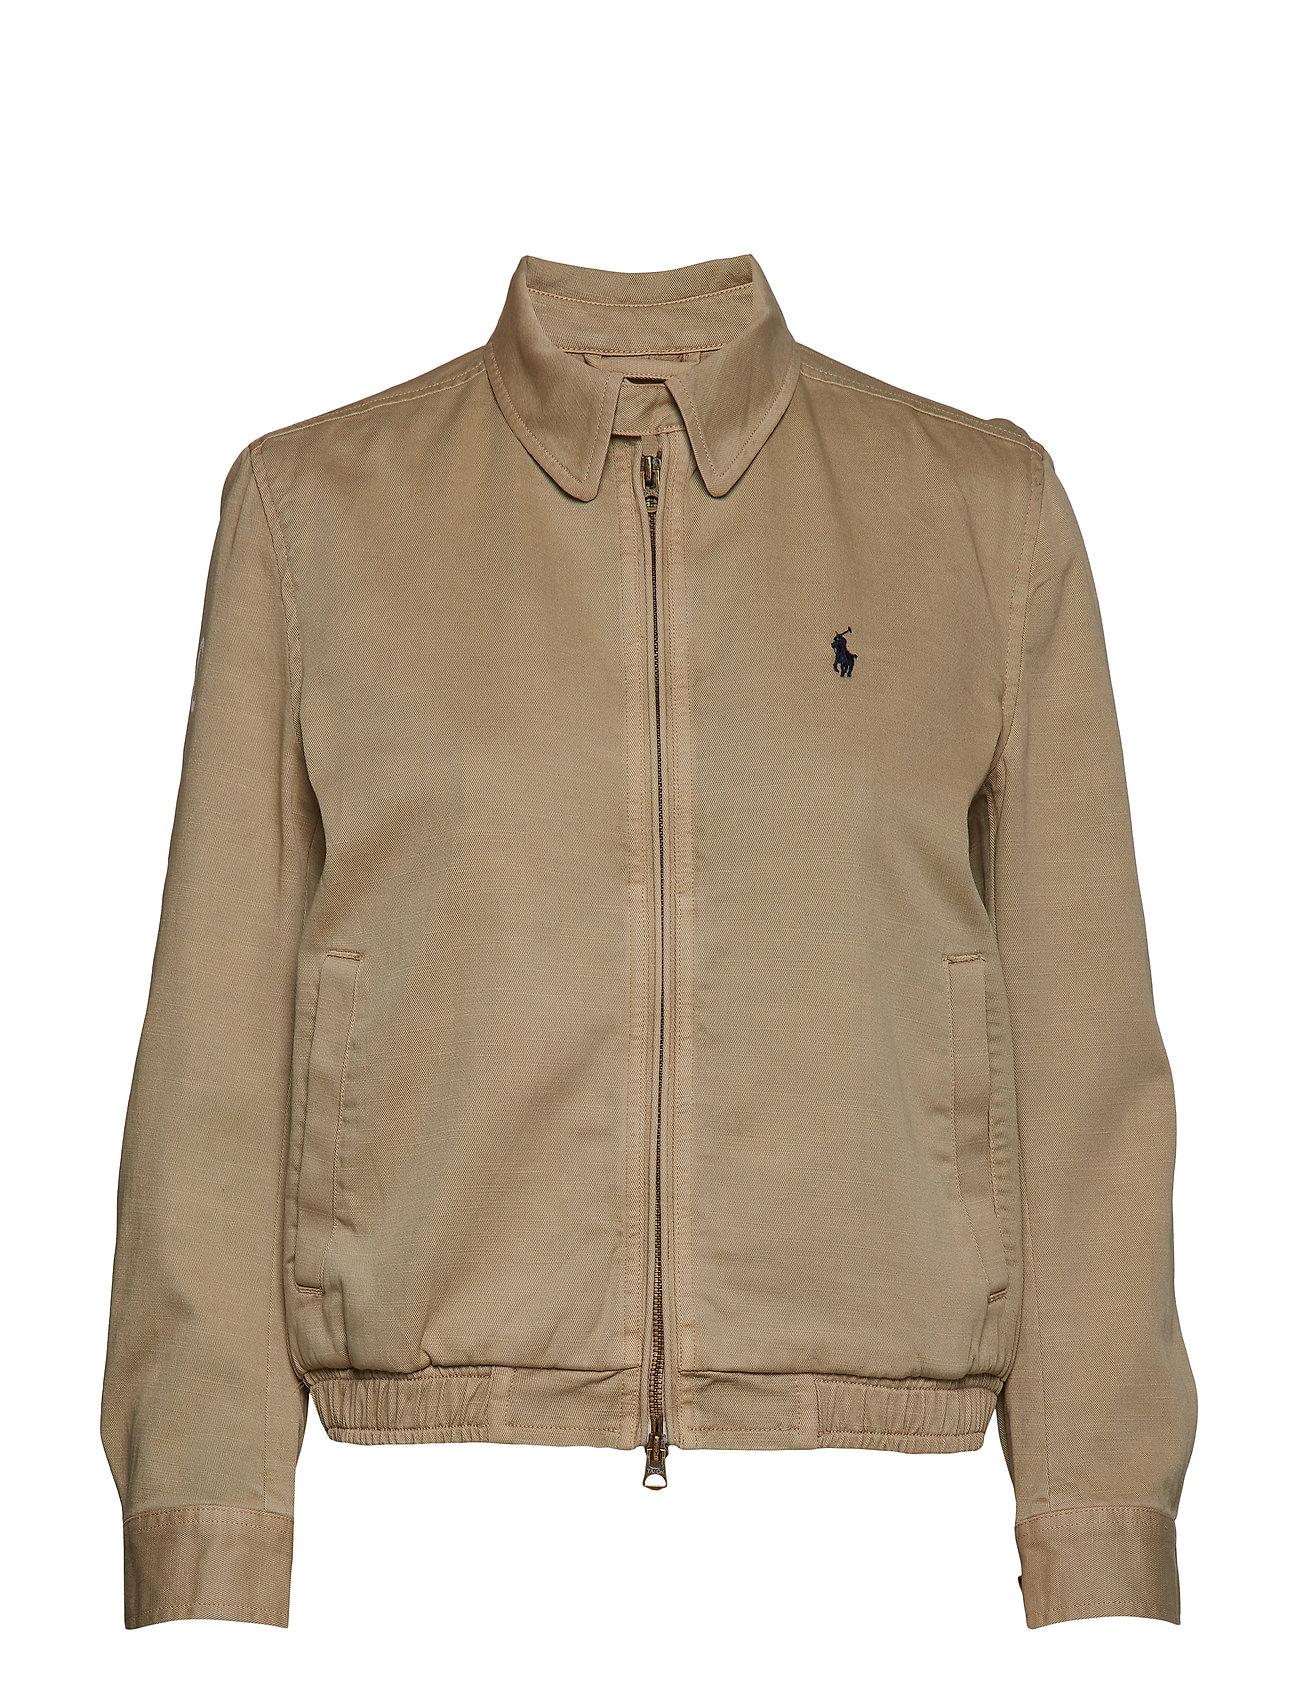 Polo Ralph Lauren Chino Windbreaker Jacket